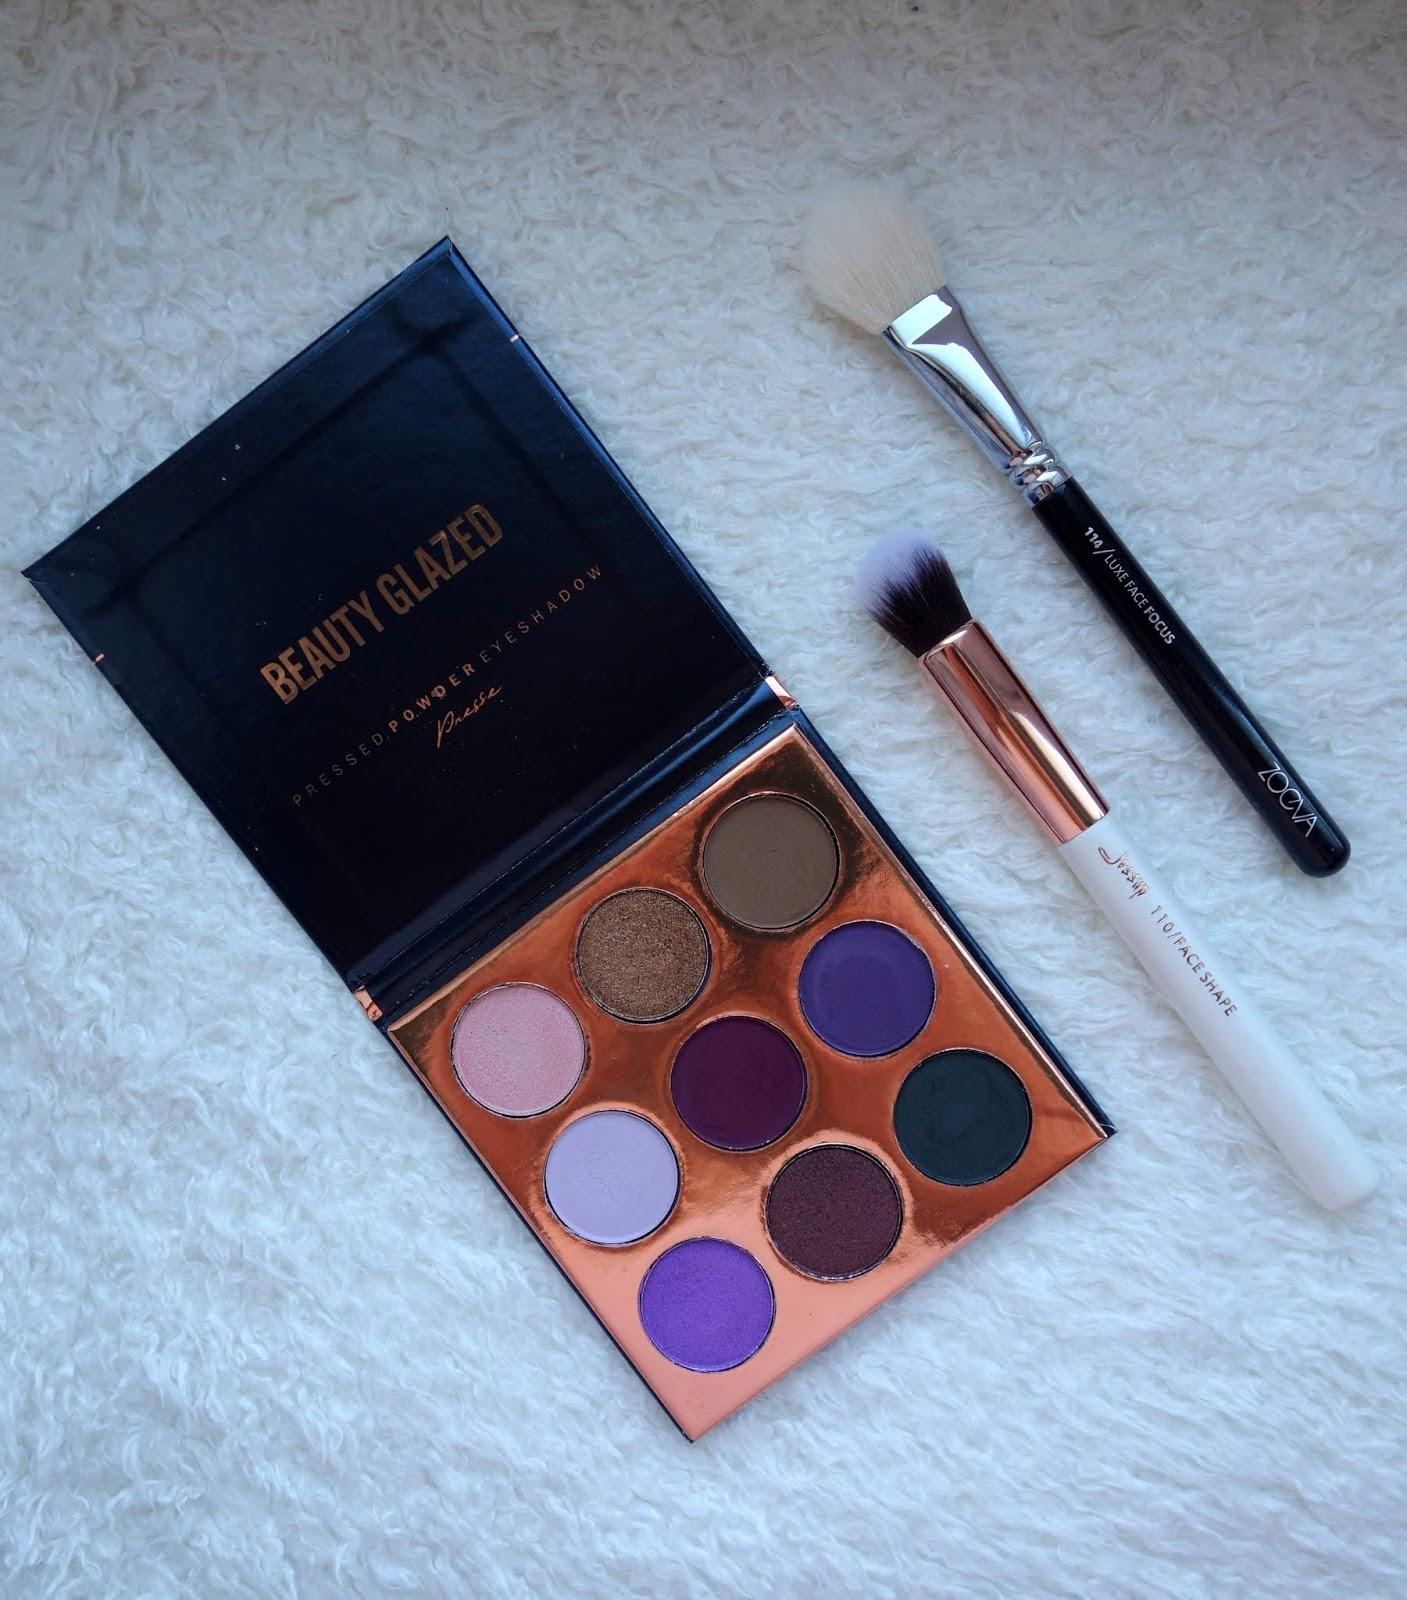 Paleta Beauty Glazed | The Purple Palette | Recenzja + swatche